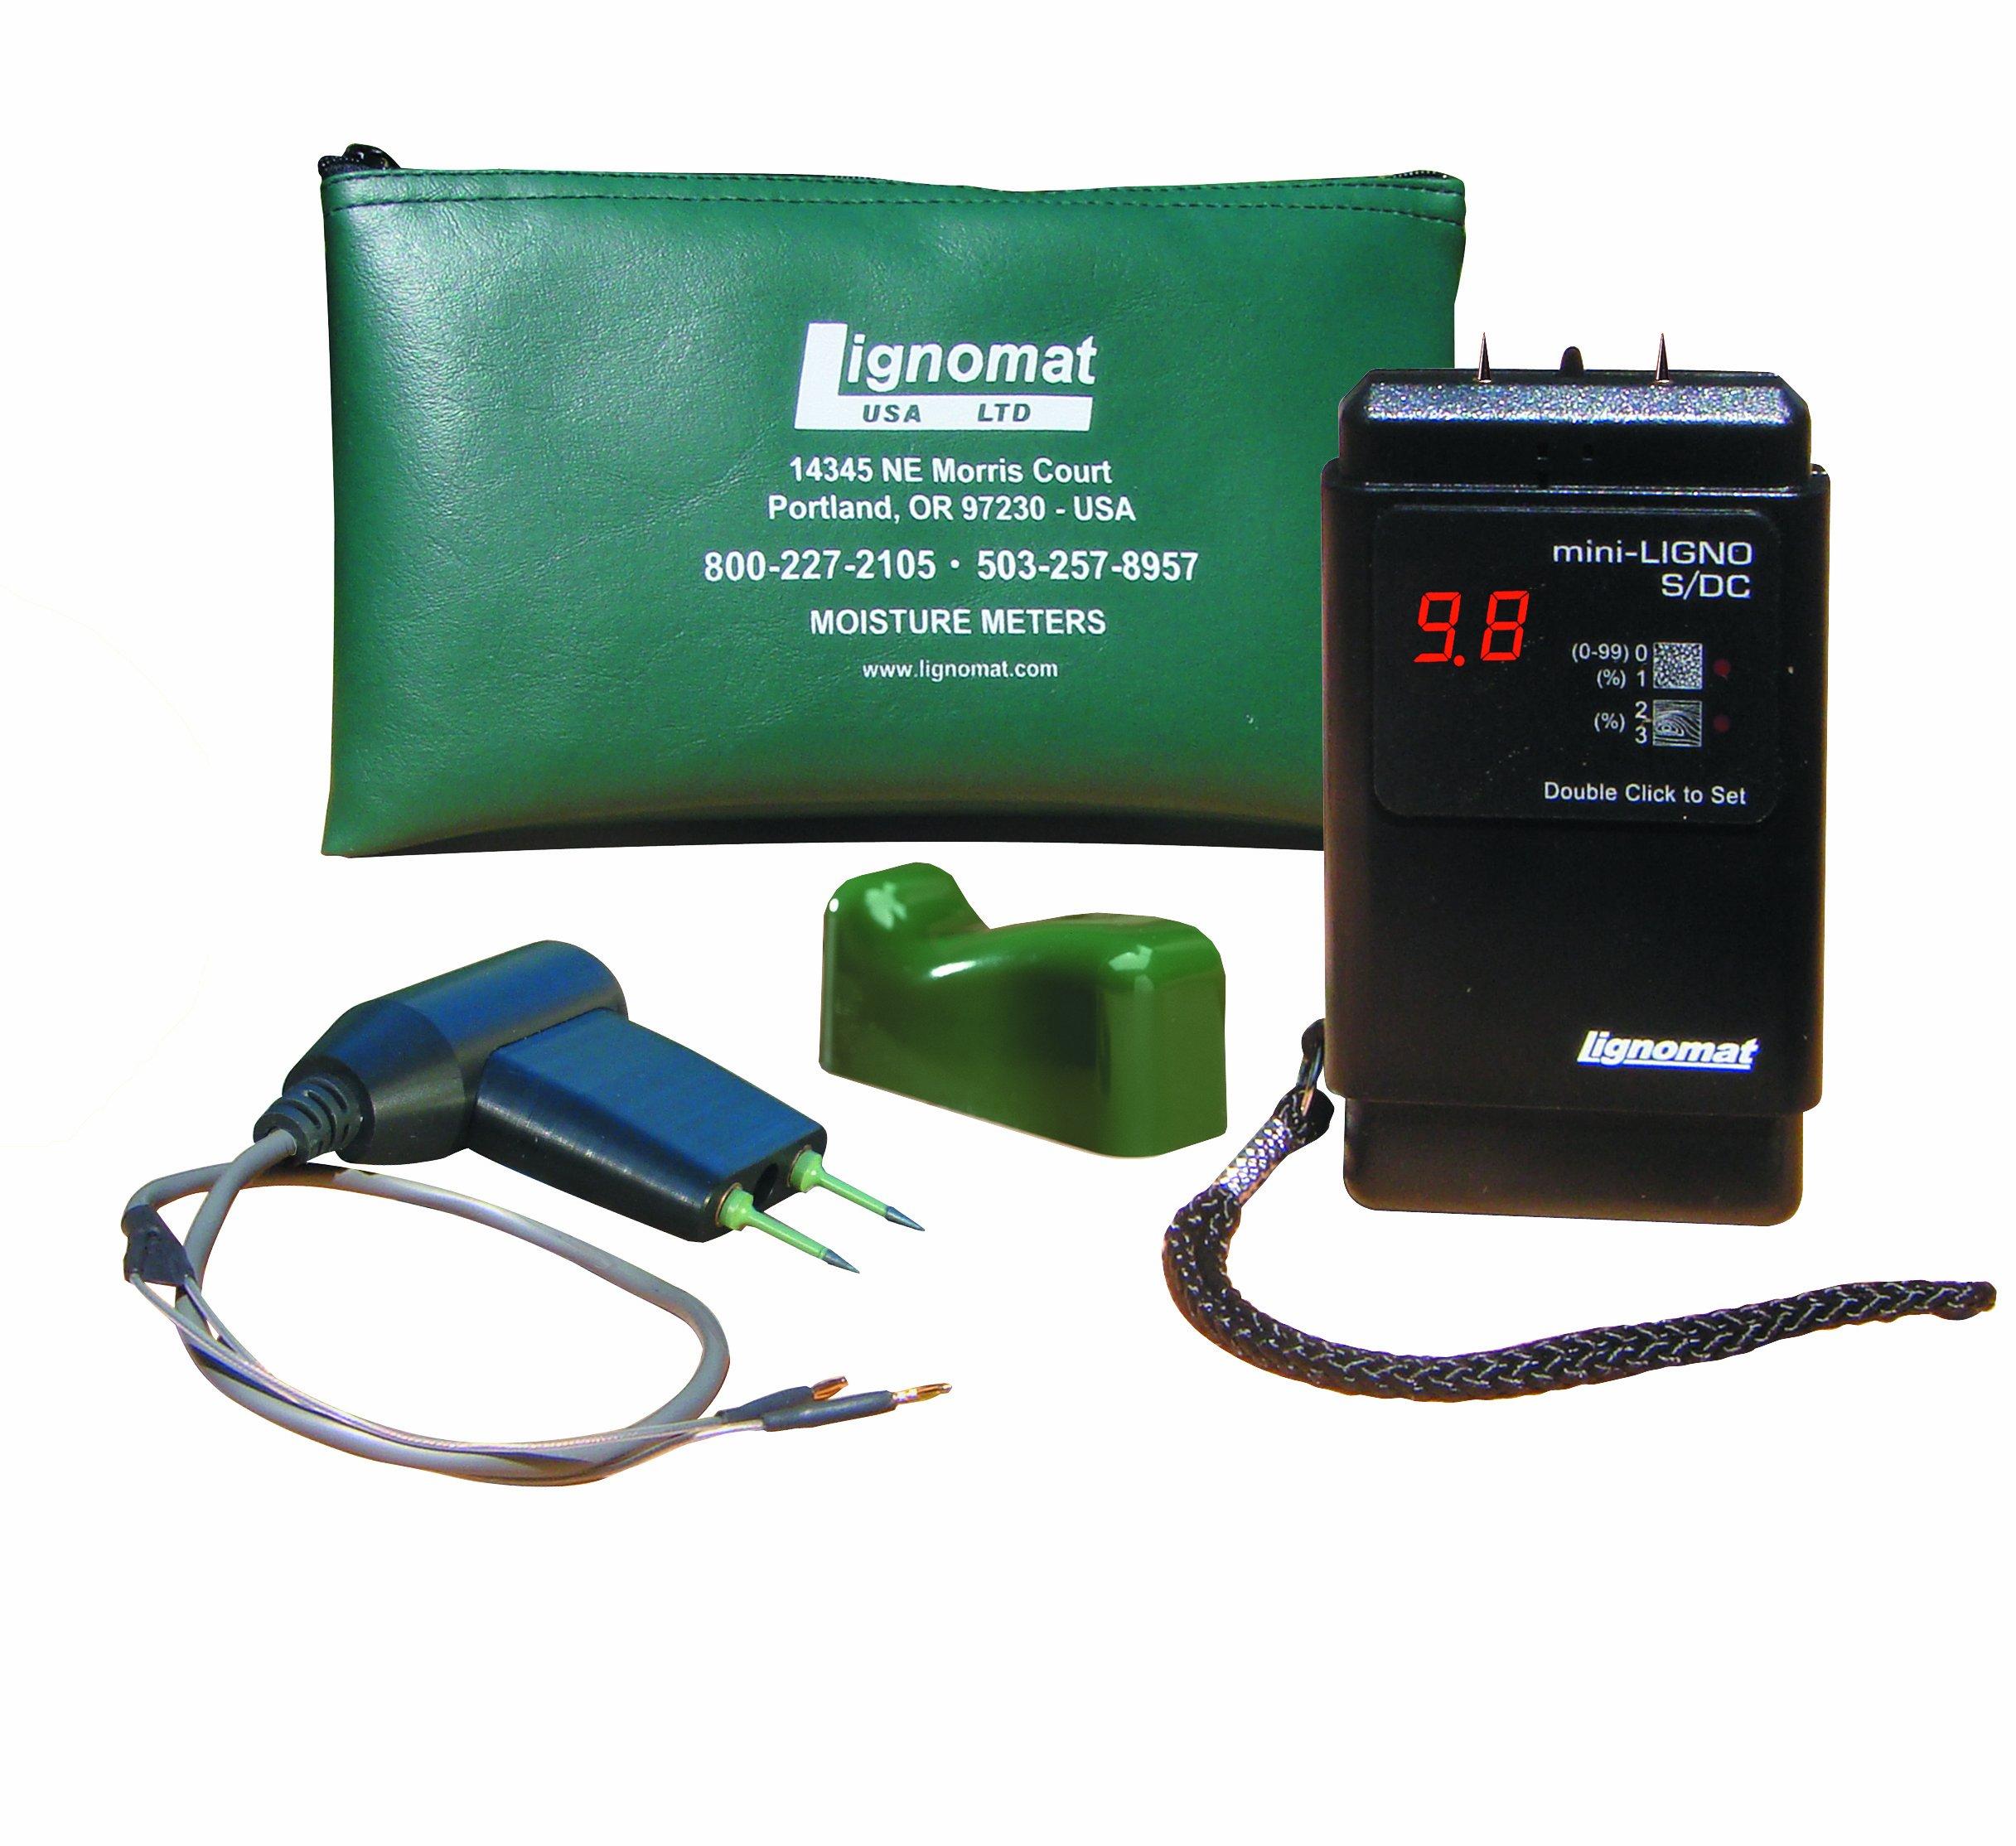 Lignomat USA S-4P Econo Package with Mini-Ligno SD/C